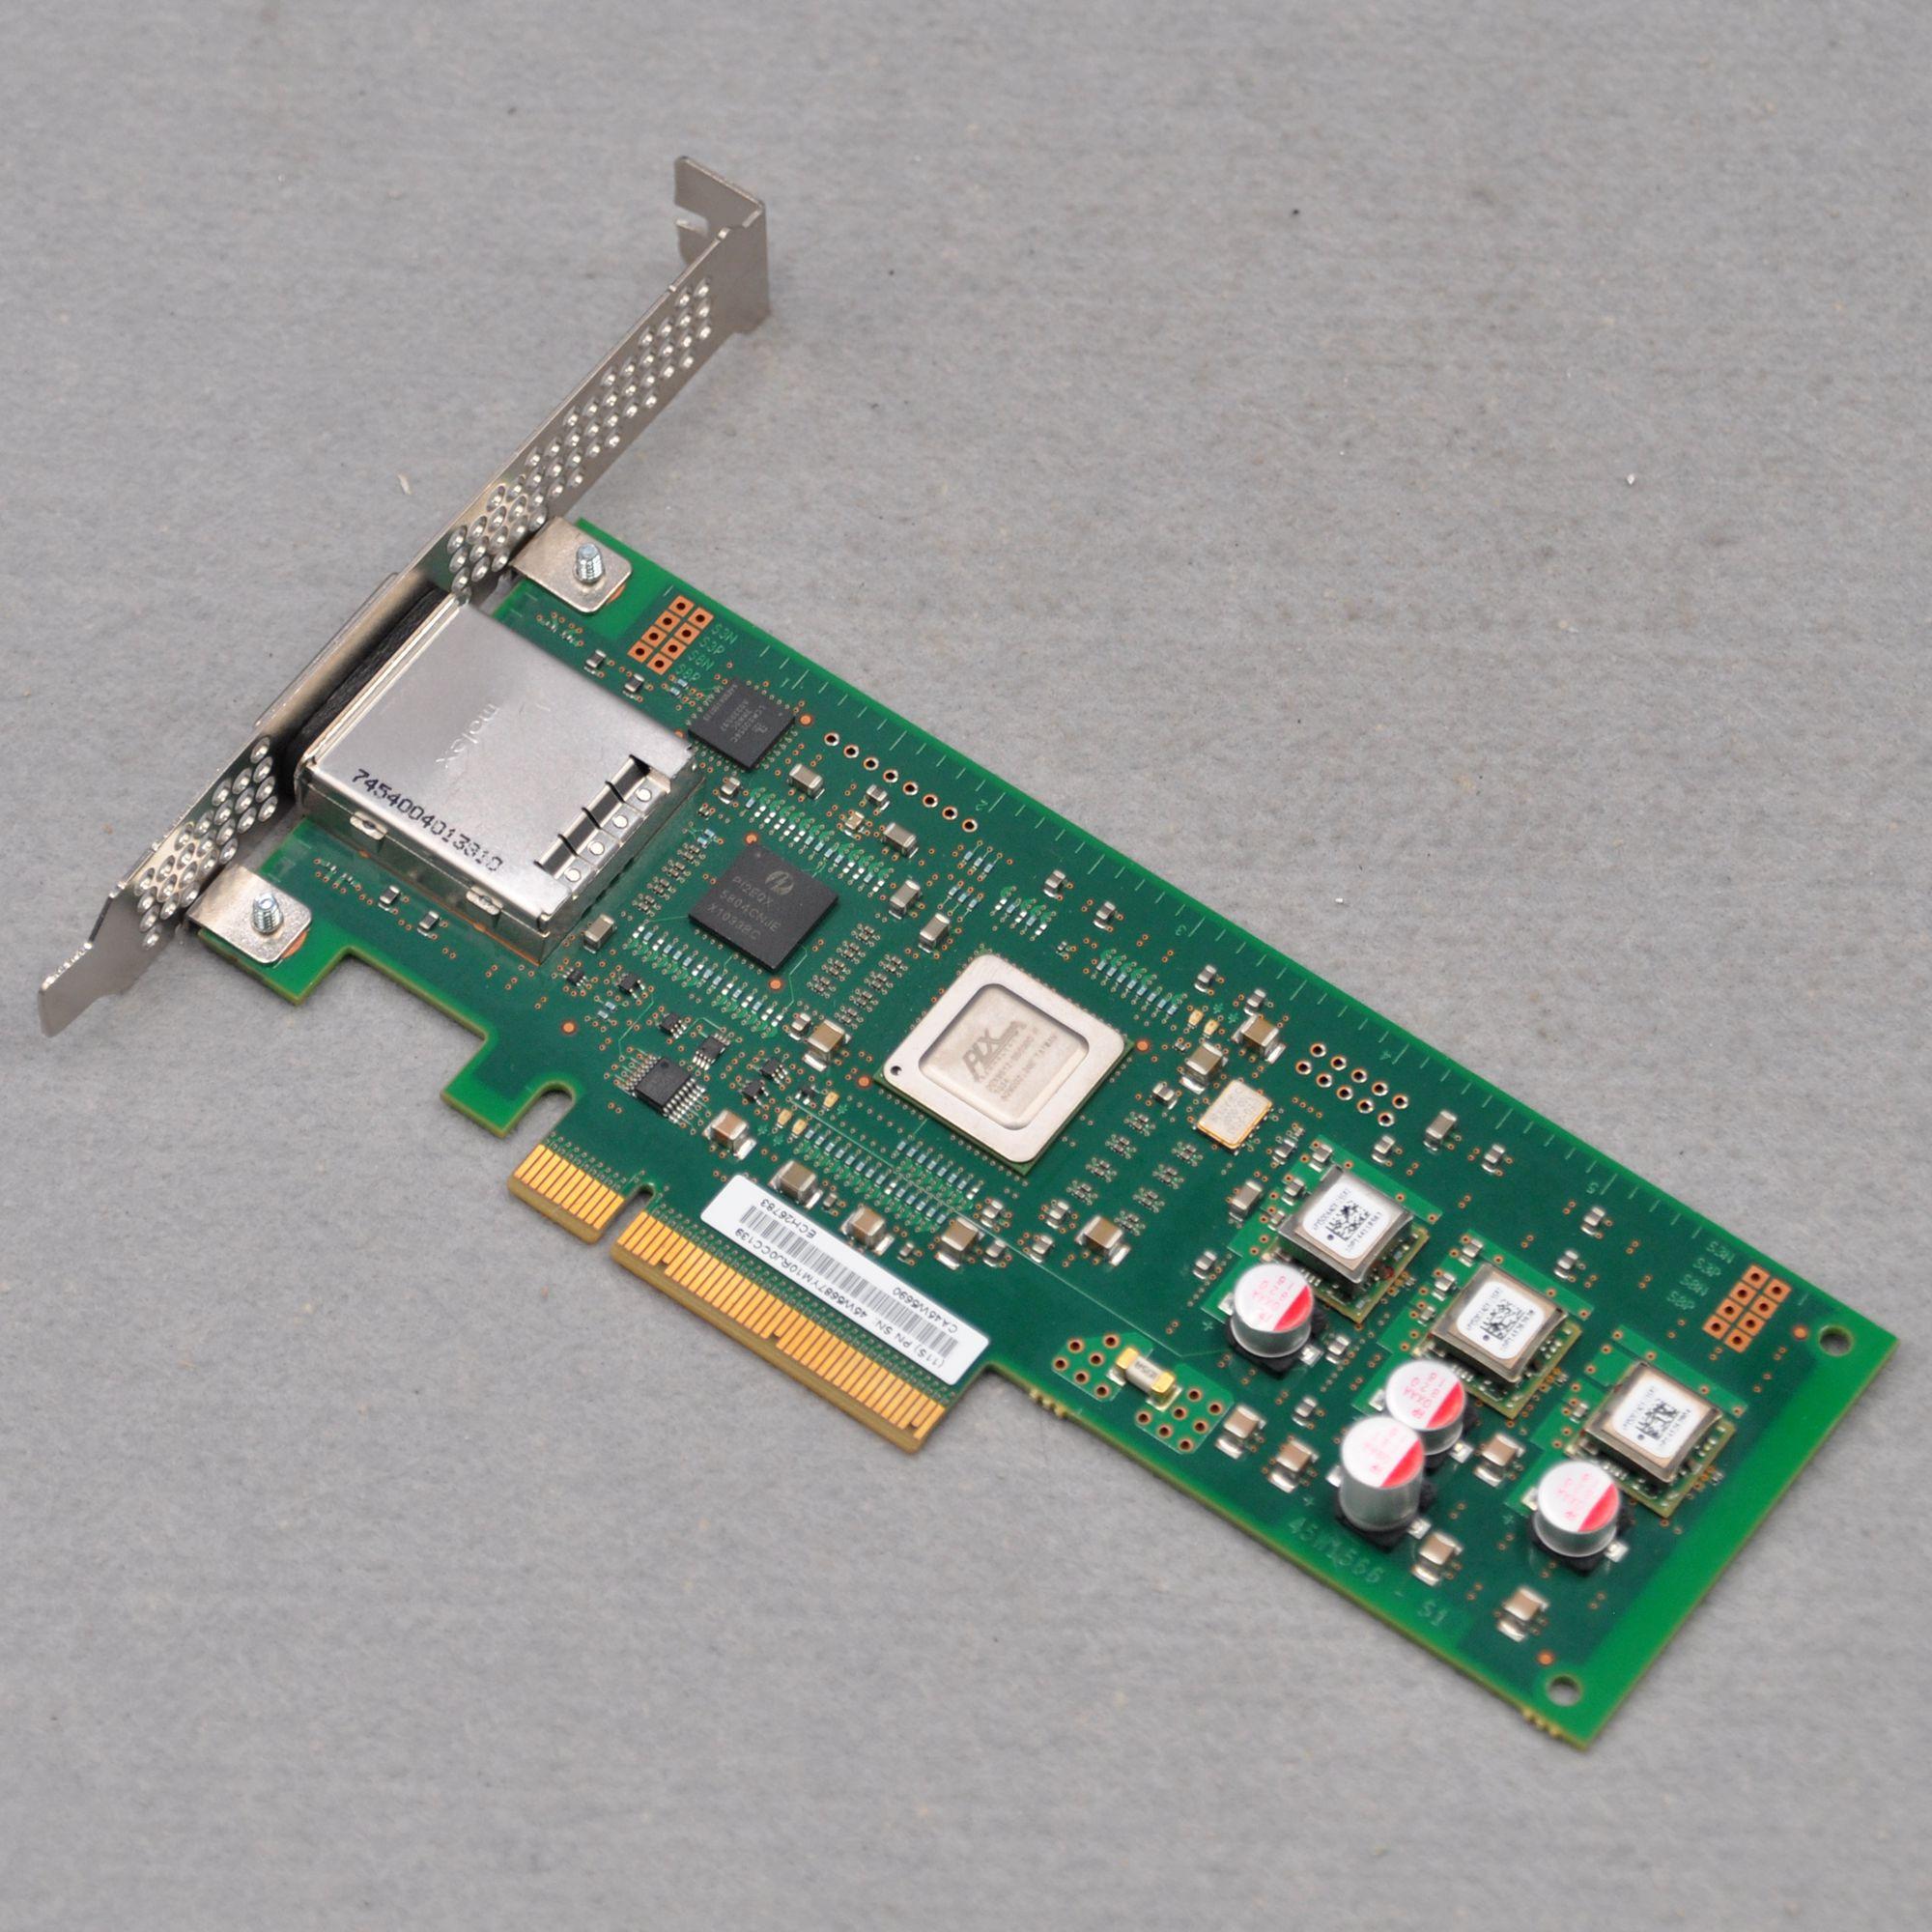 IBM 45W1566-S10 PCI card